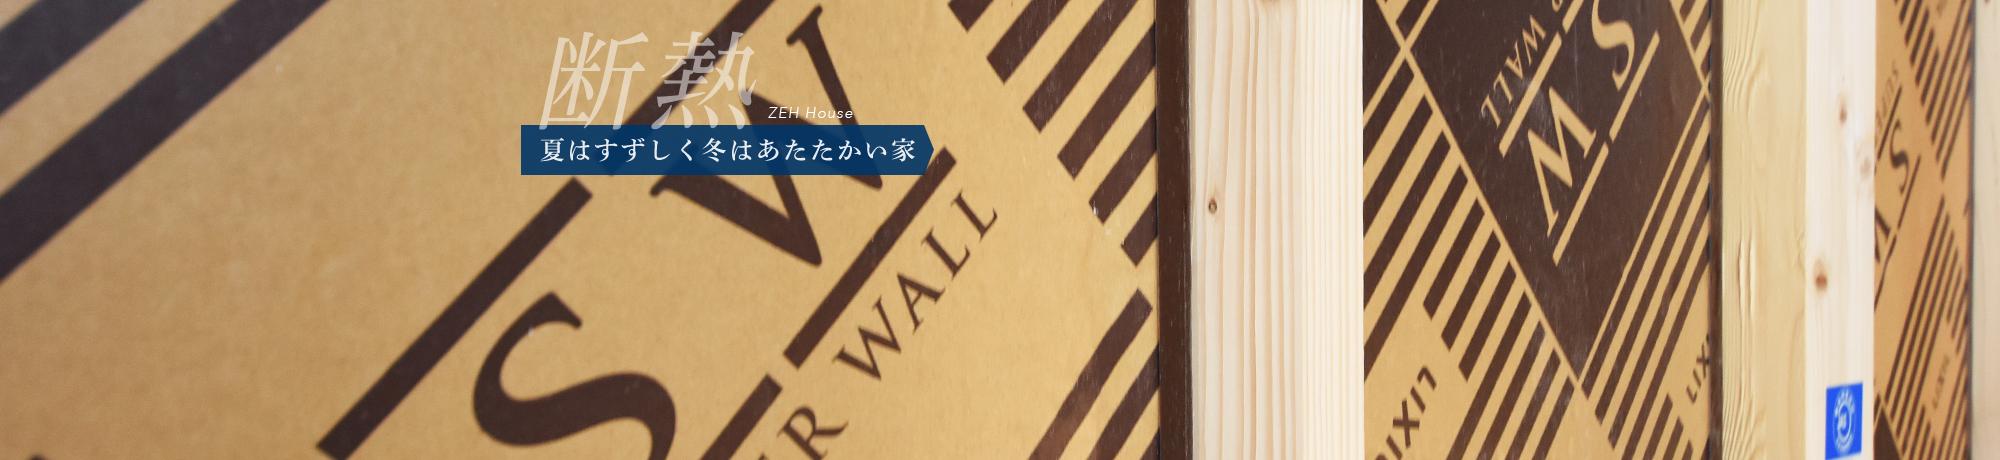 京都市内の断熱性能No.1住宅